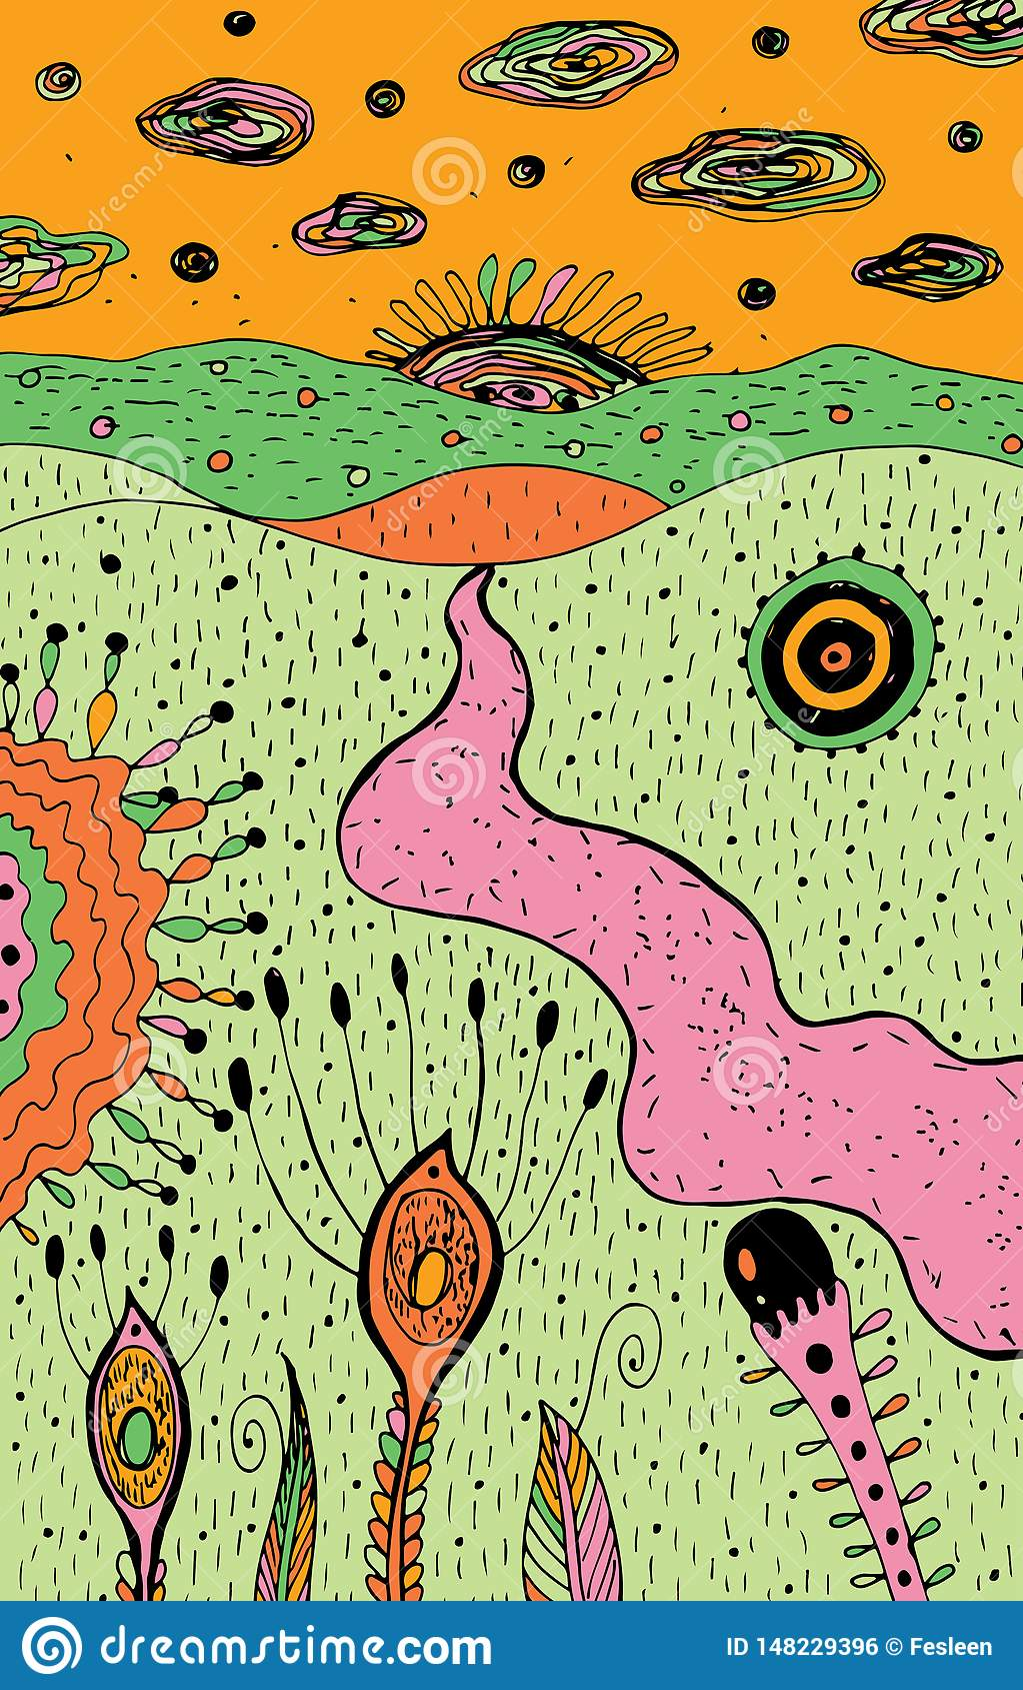 Cartoon Psychedelic Landscape Colorful Hippie Art